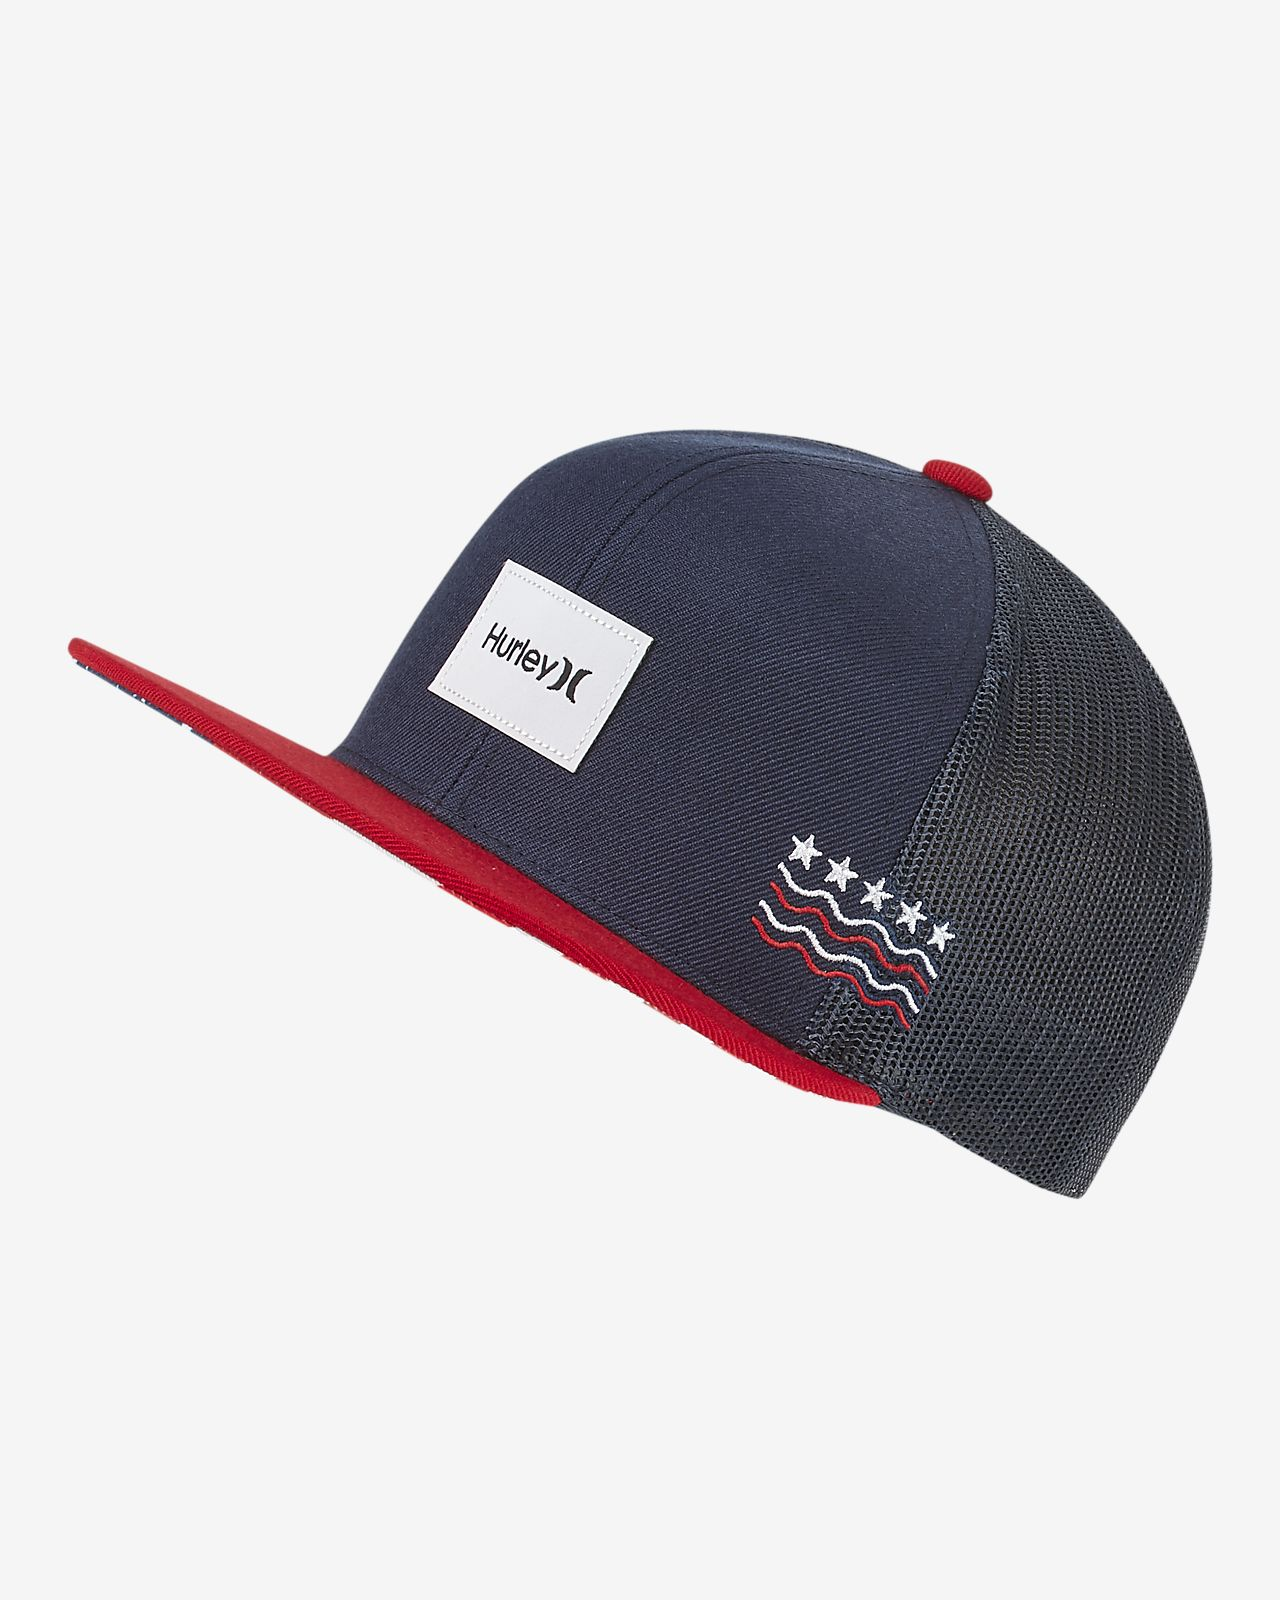 9aae2dbc7 Hurley Freedom Riders Men's Hat